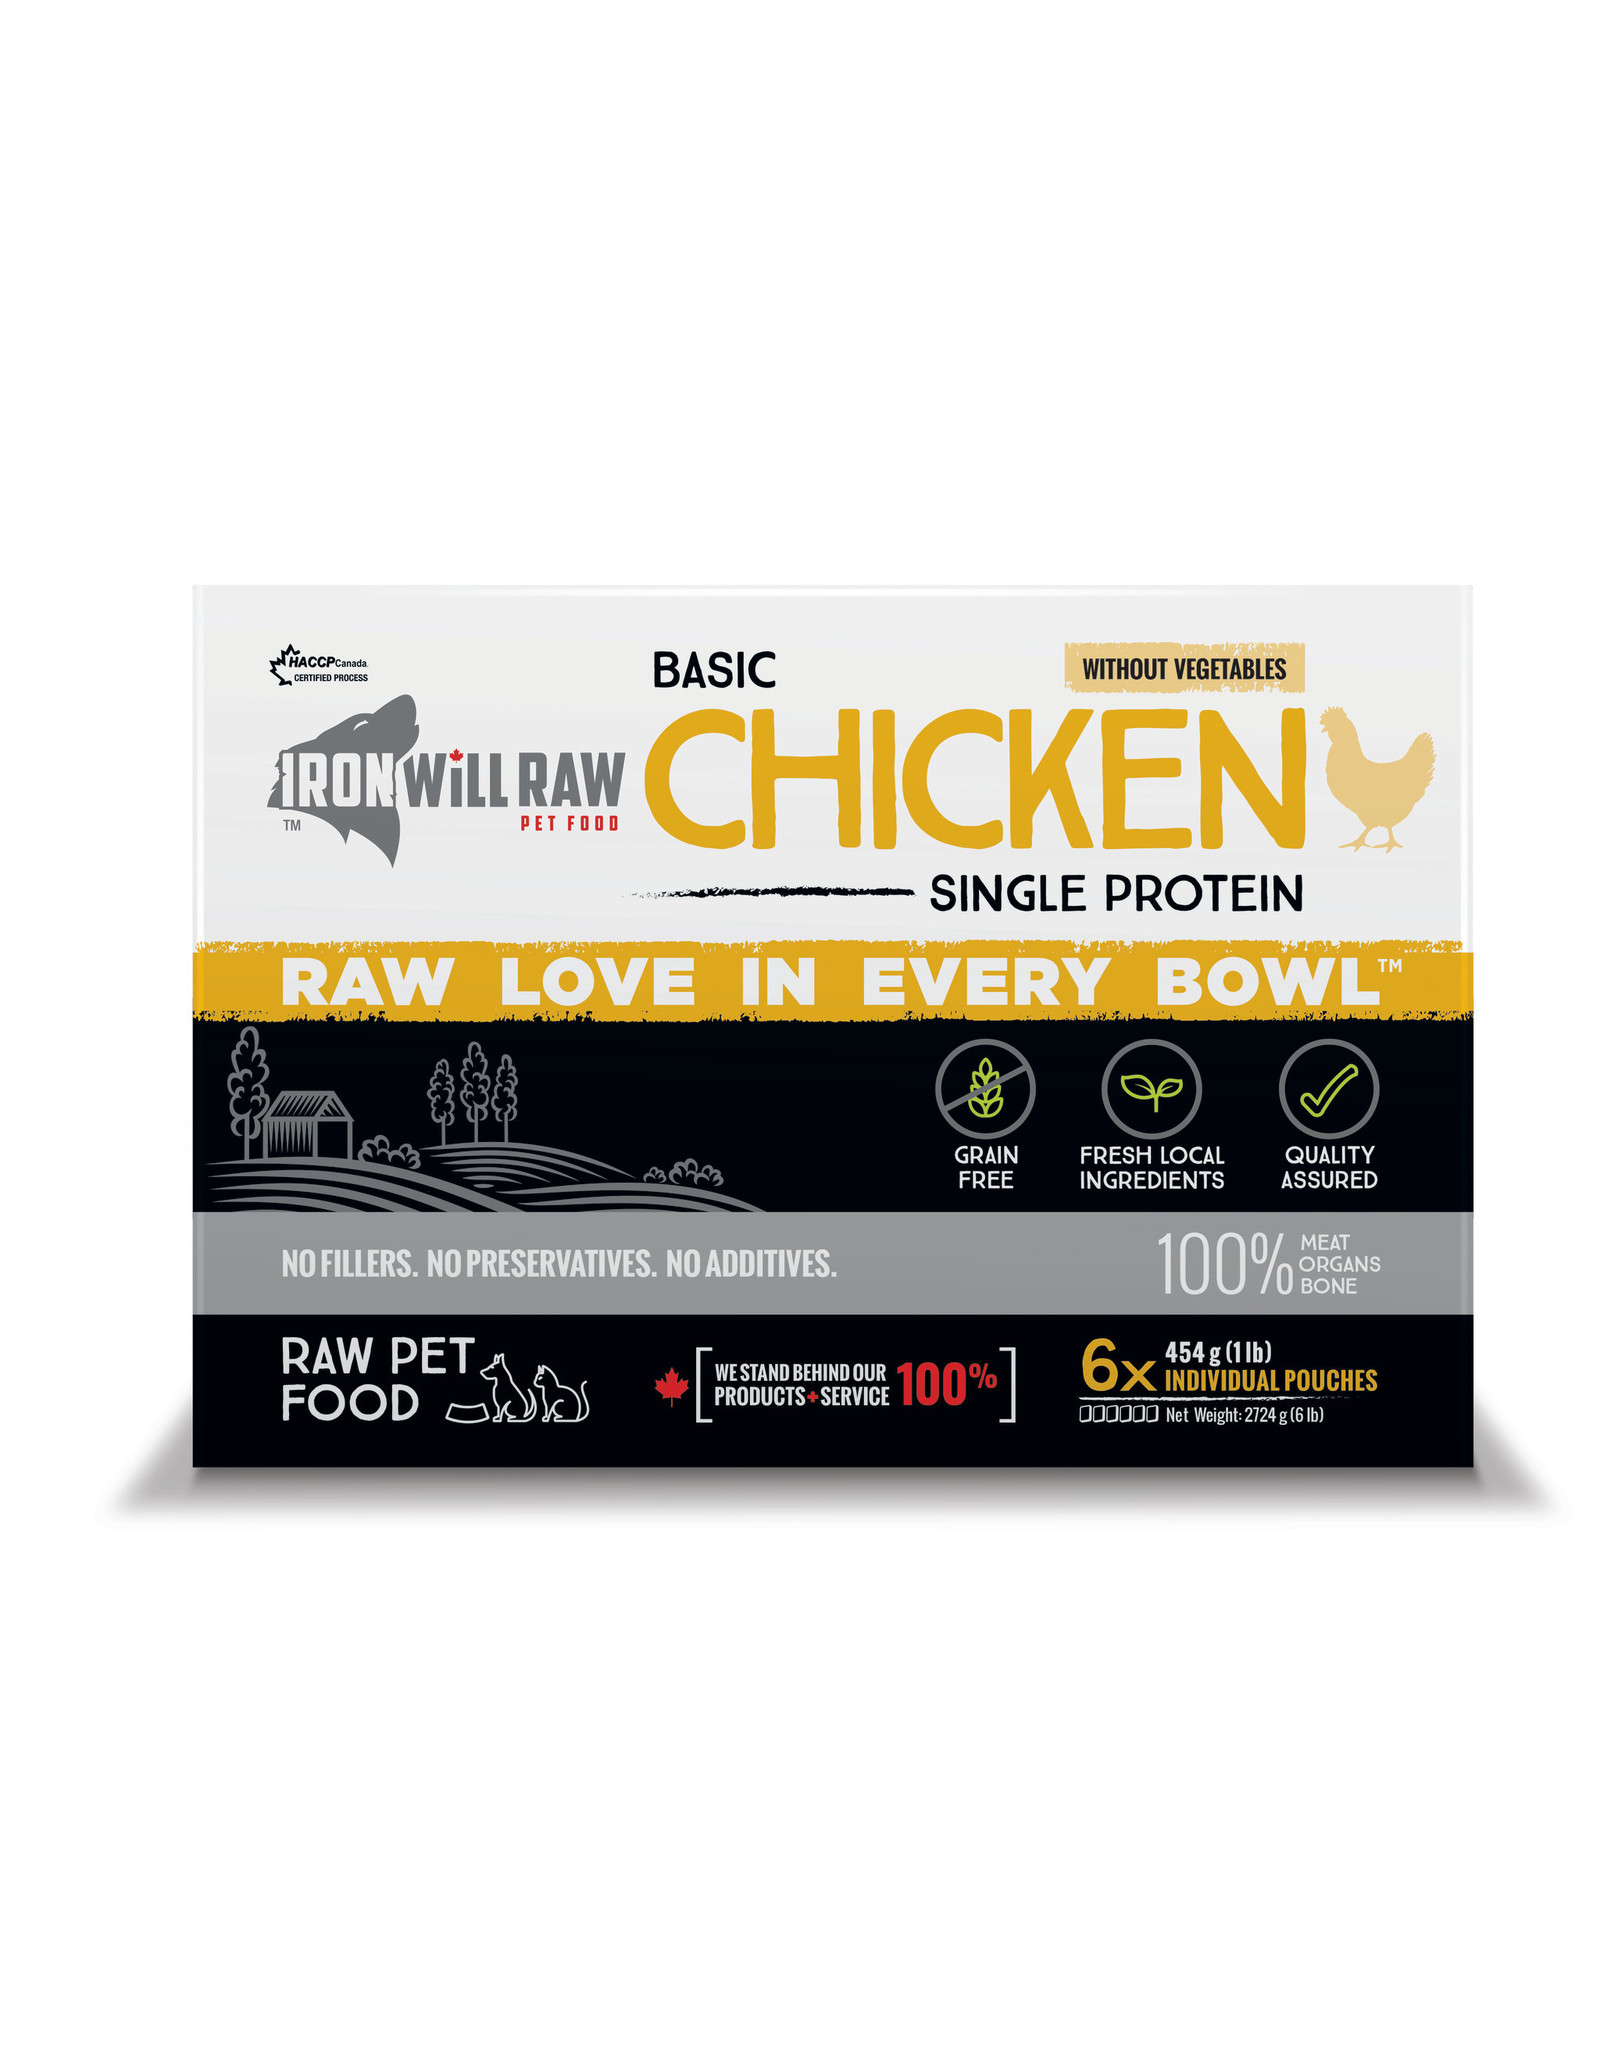 Iron Will Raw Iron Will Basic Chicken 6lb Box